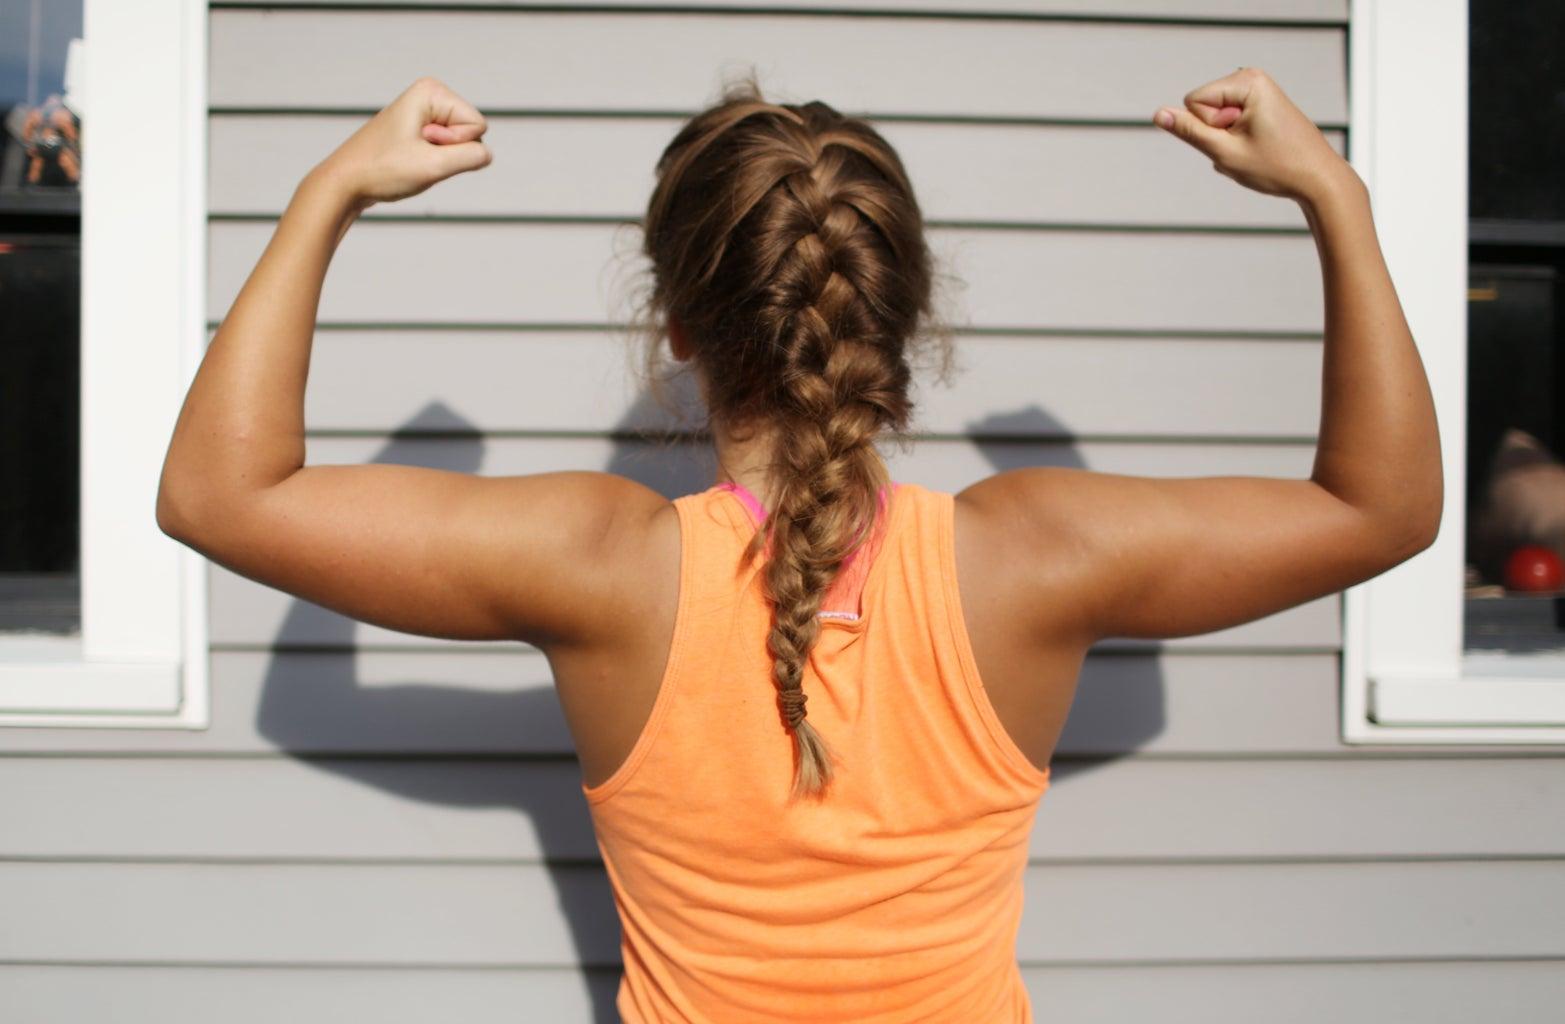 Strong Arms Girl